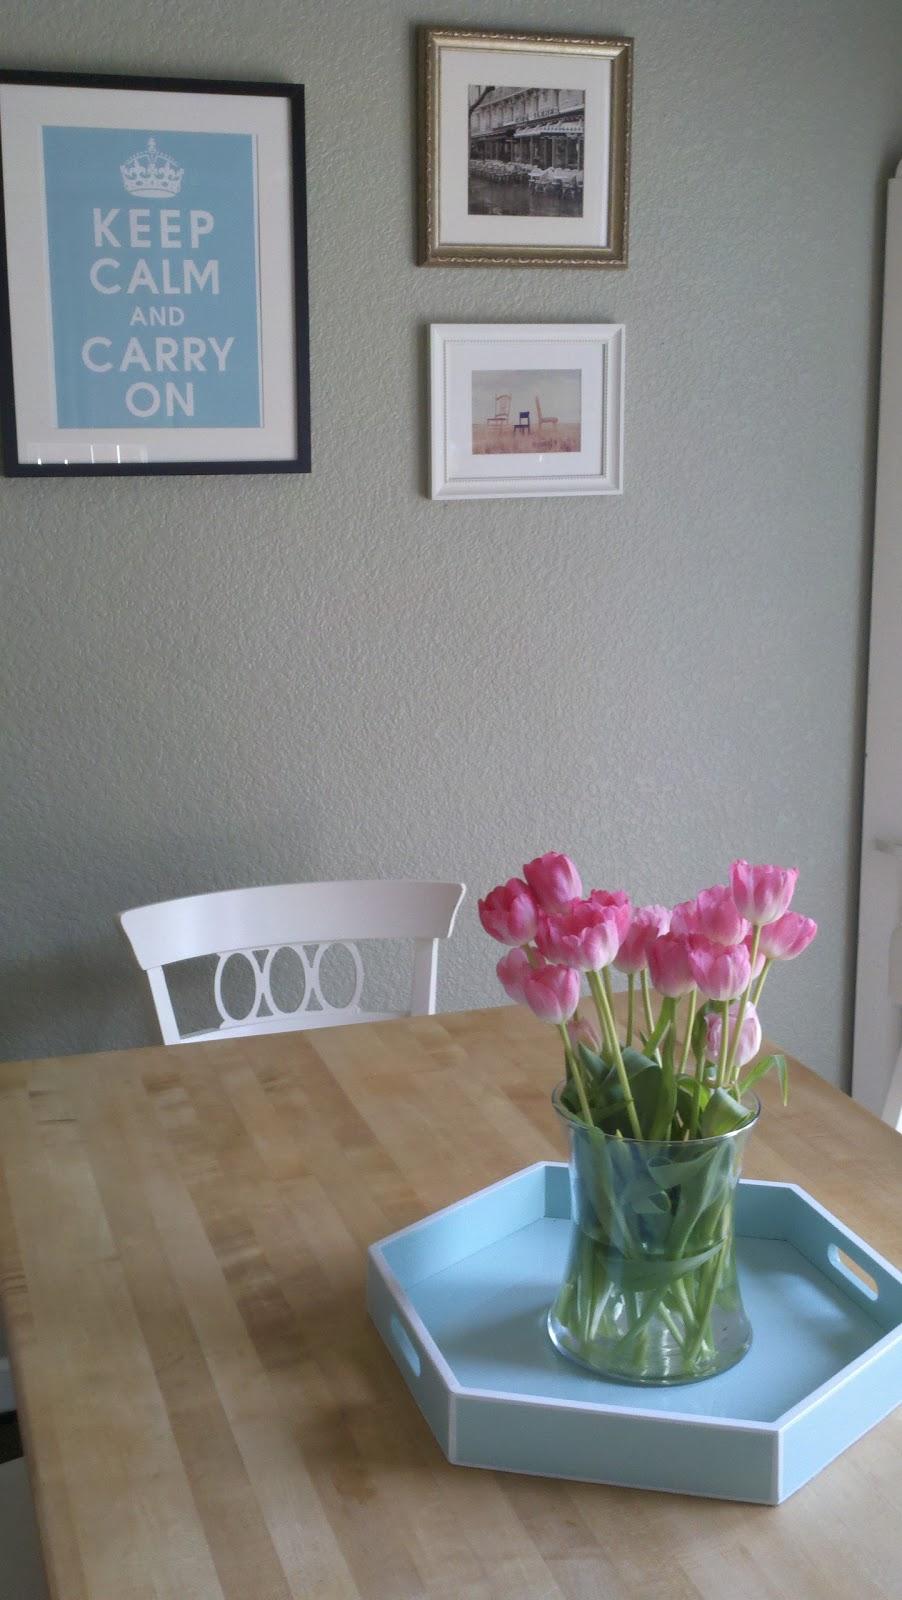 Home sweet heidi kitchen paint color Light airy paint colors